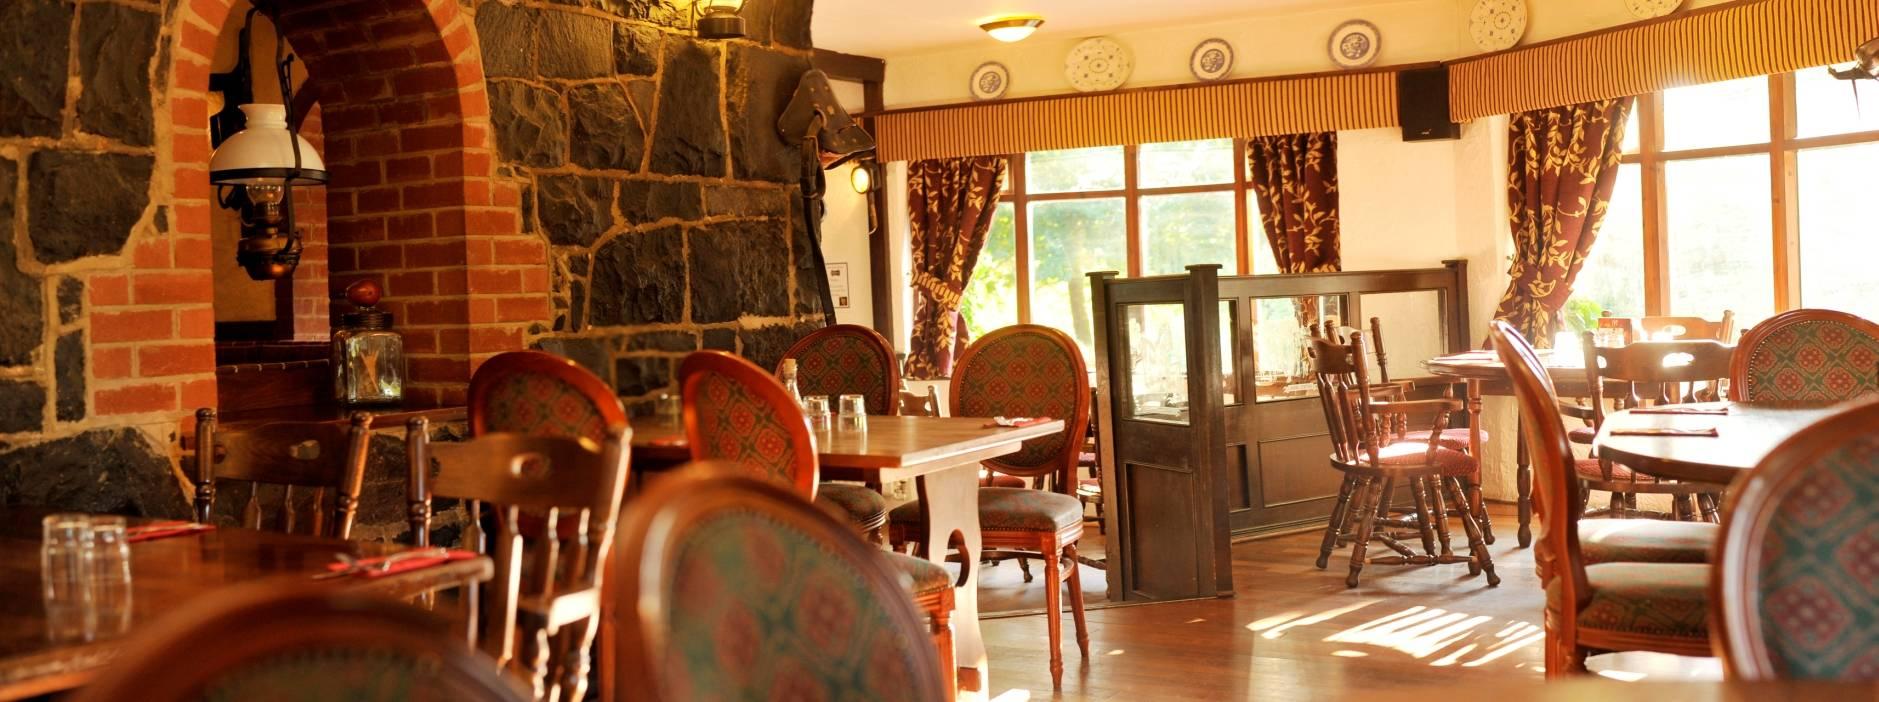 Stable Restaurant Coleraine Bushtown Hotel